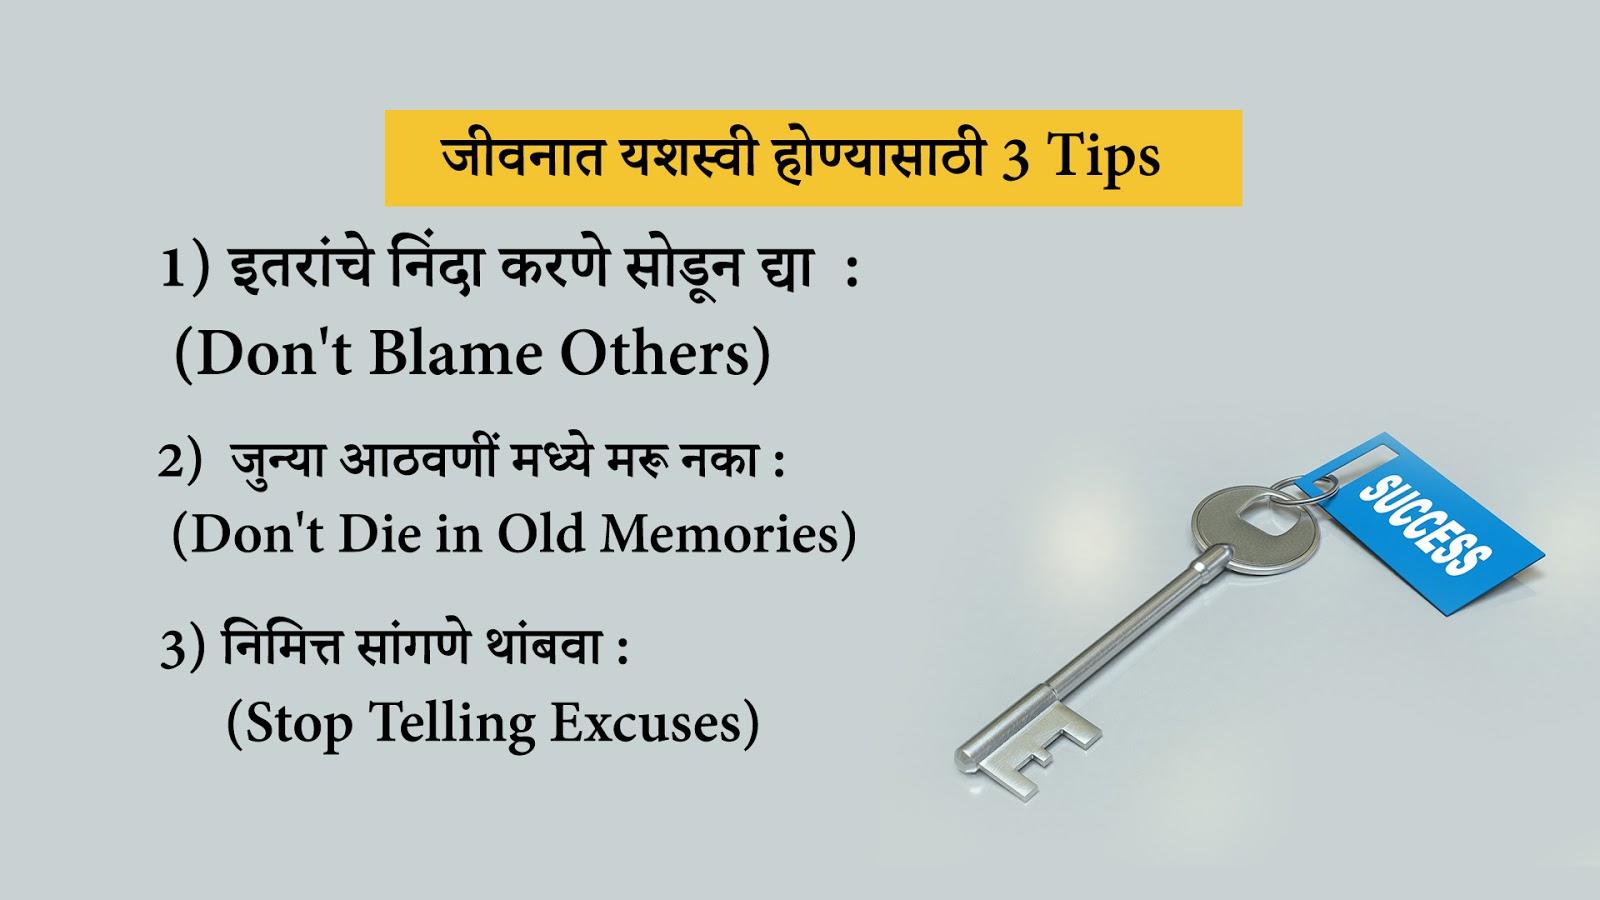 जीवनात यशस्वी होण्यासाठी 3 Tips - 3 Tips to become Successful in Life in Marathi - Marathi Motivational Articles